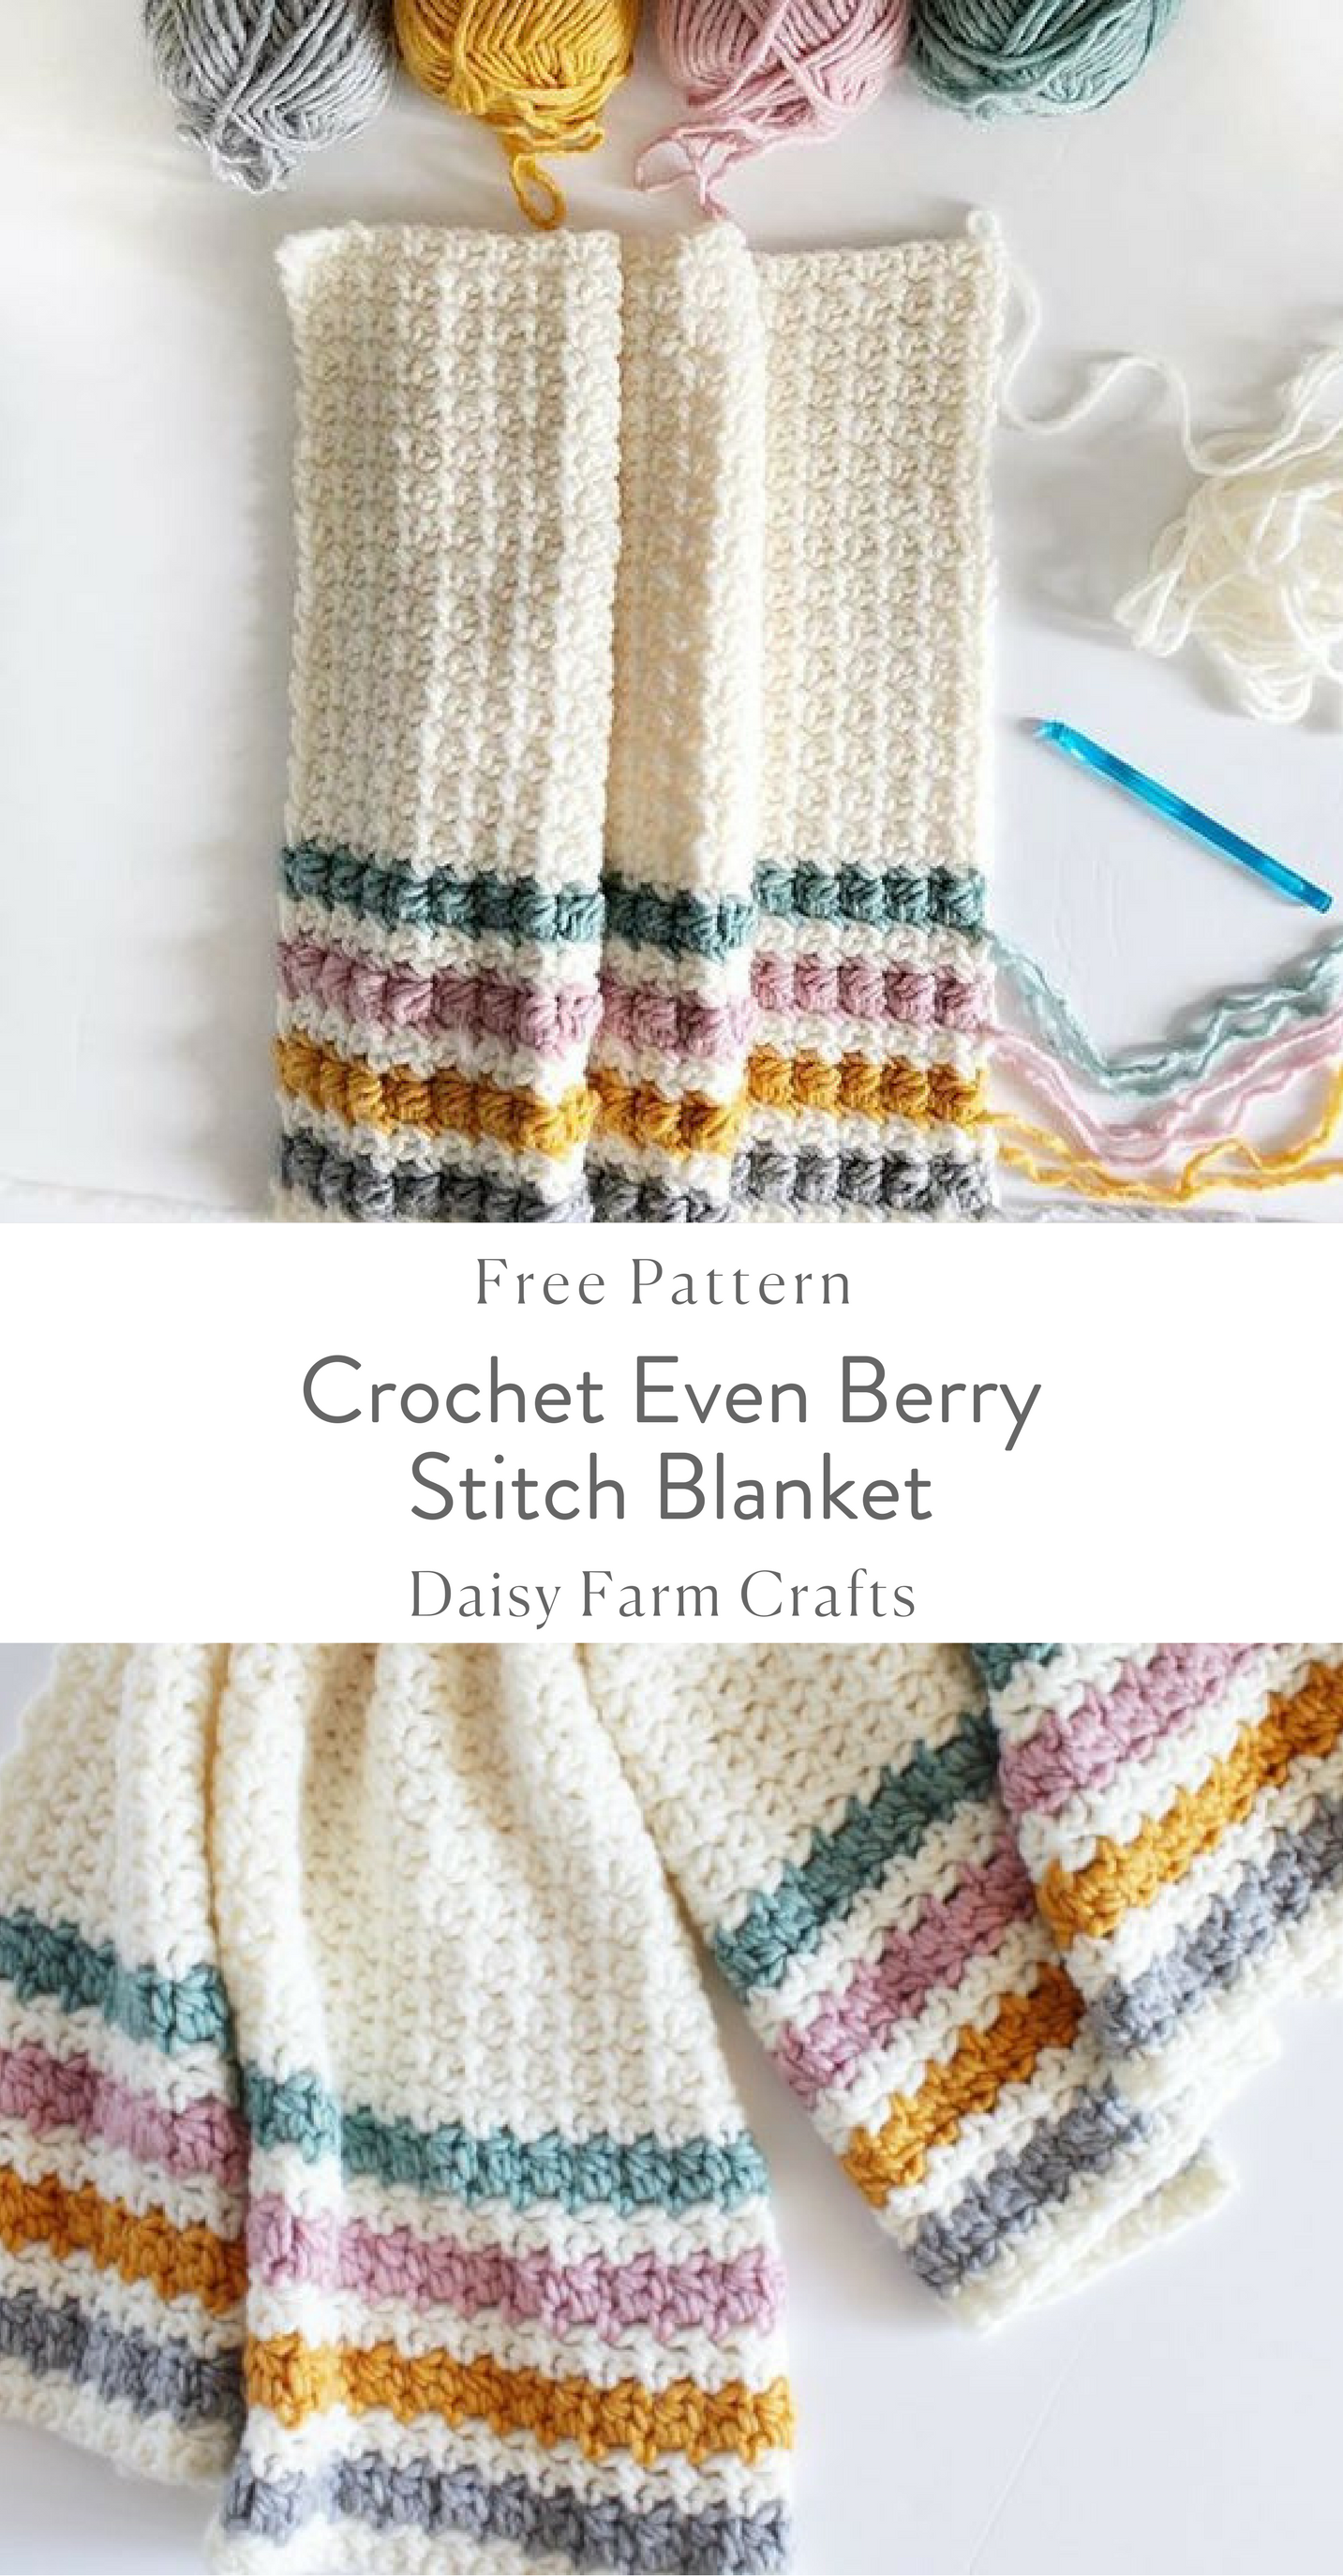 Crochet Even Berry Stitch Blanket - Free Pattern | Crochet patterns ...